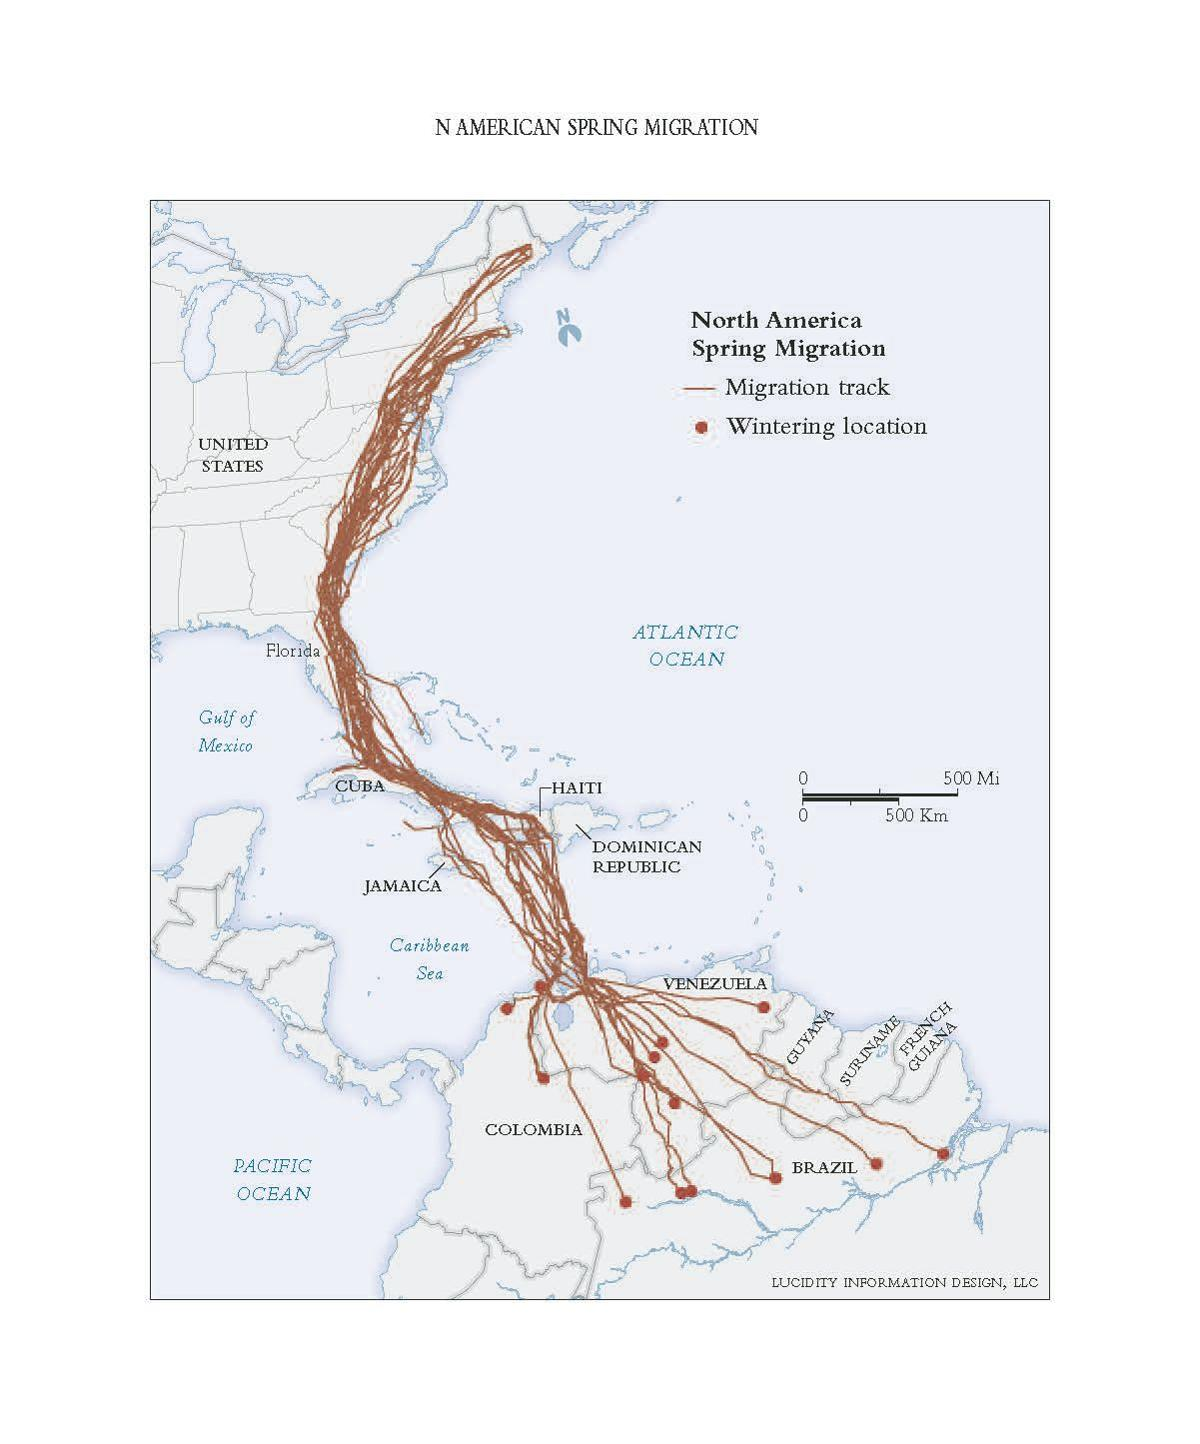 Osprey Migration Map